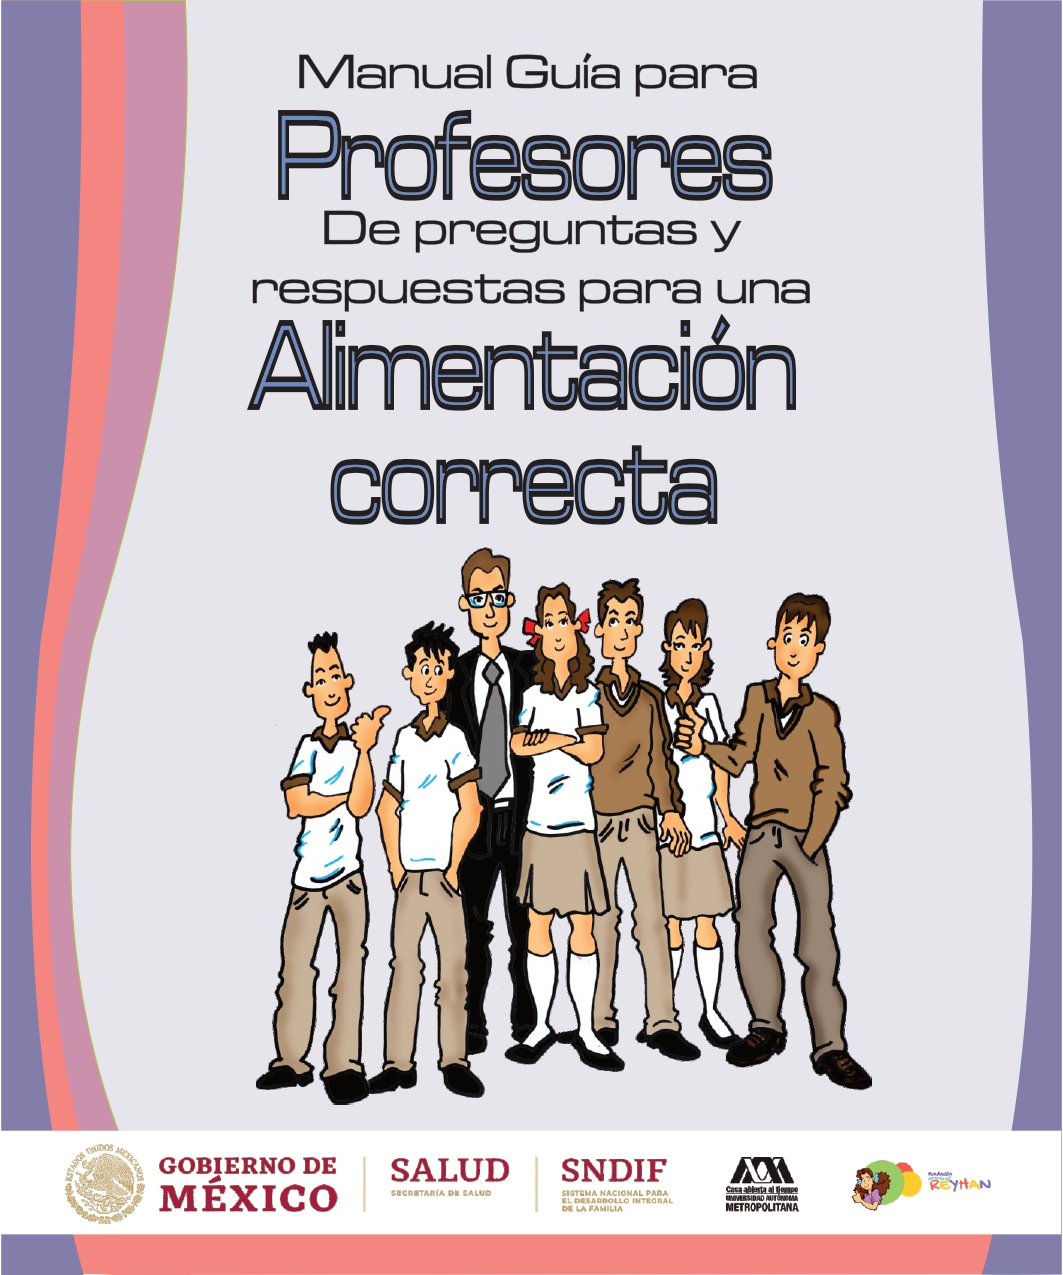 Manual profesores digital_page-0001